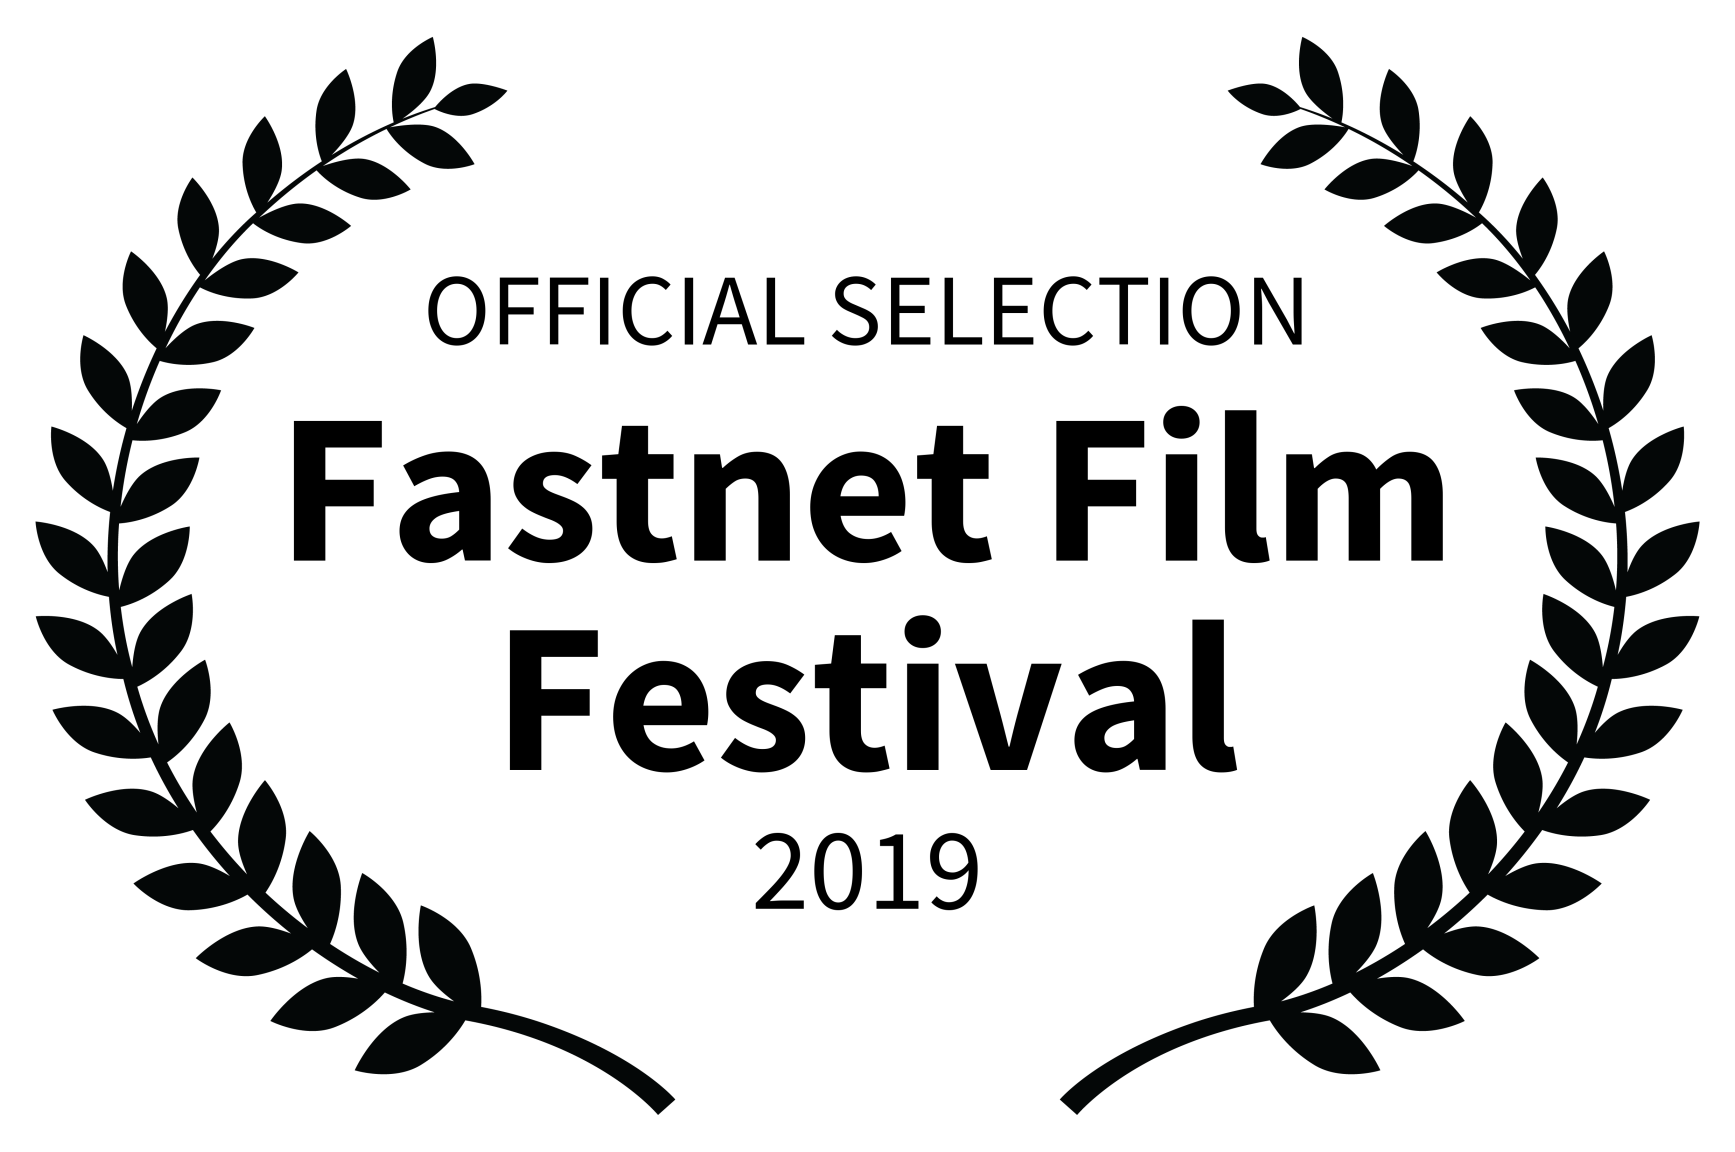 OFFICIAL SELECTION - Fastnet Film Festival - 2019